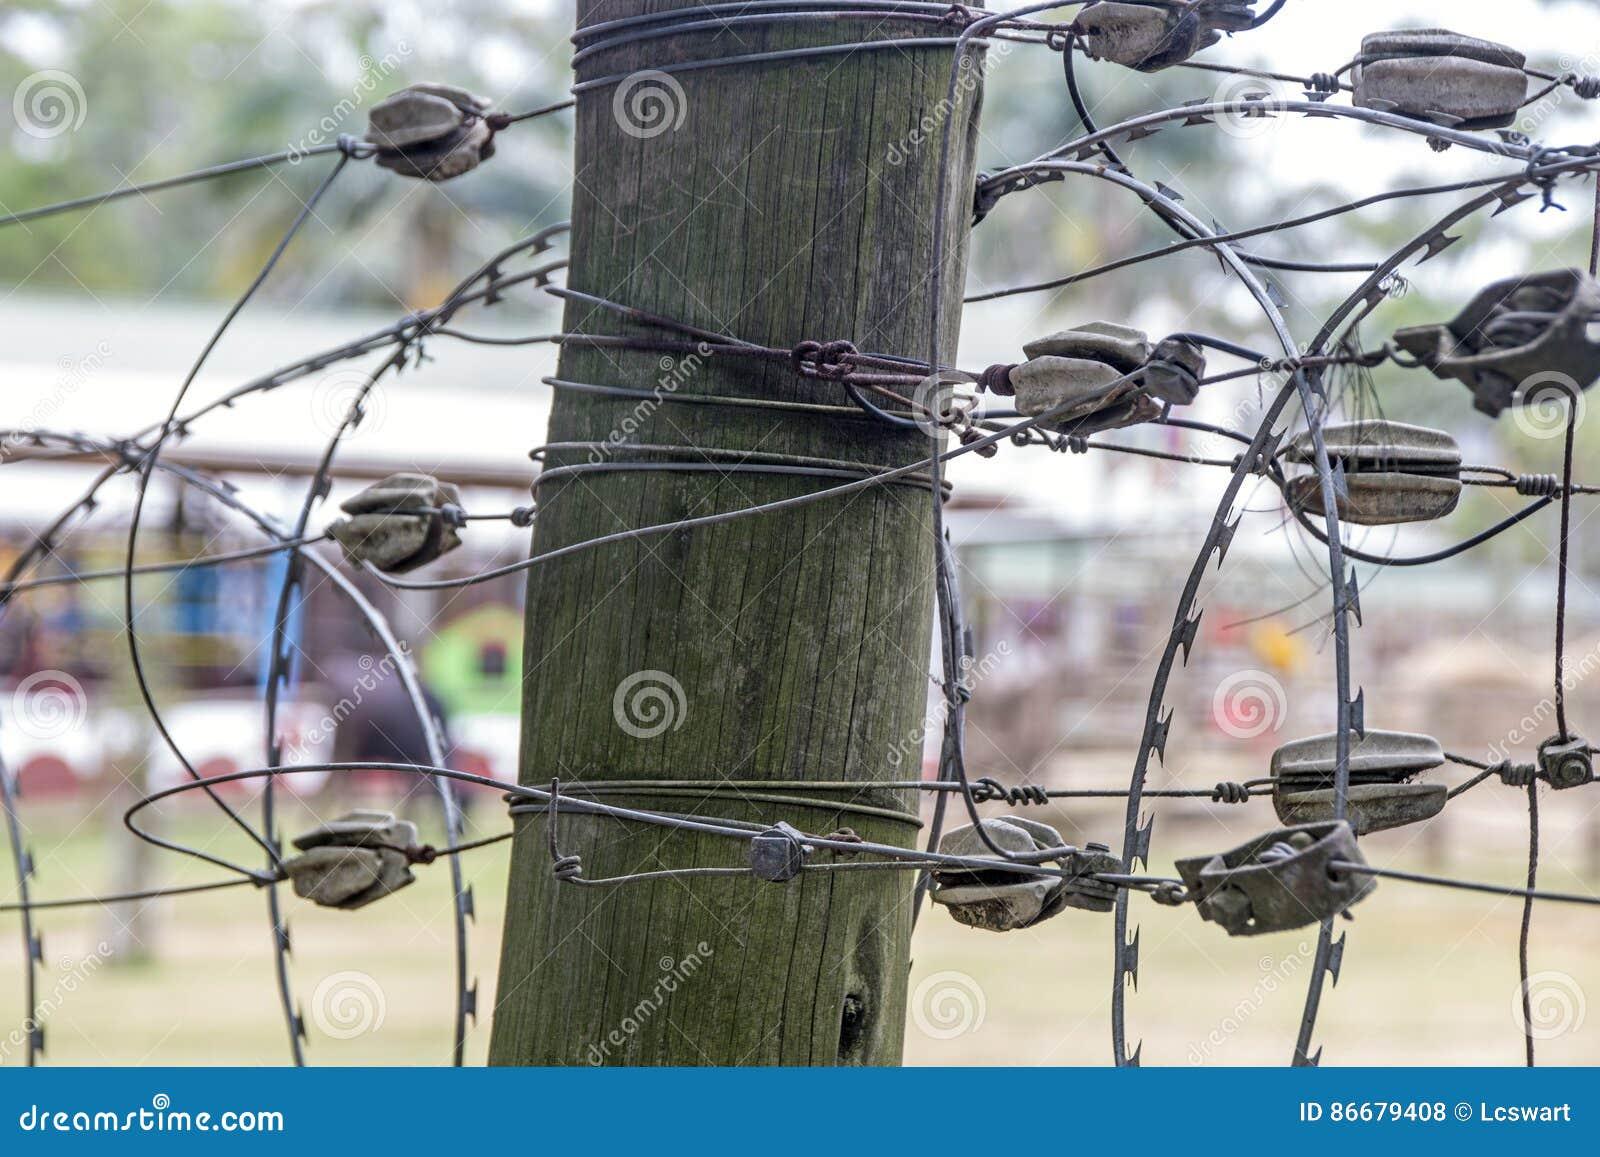 Tolle Stacheldraht Folter Fotos - Verdrahtungsideen - korsmi.info